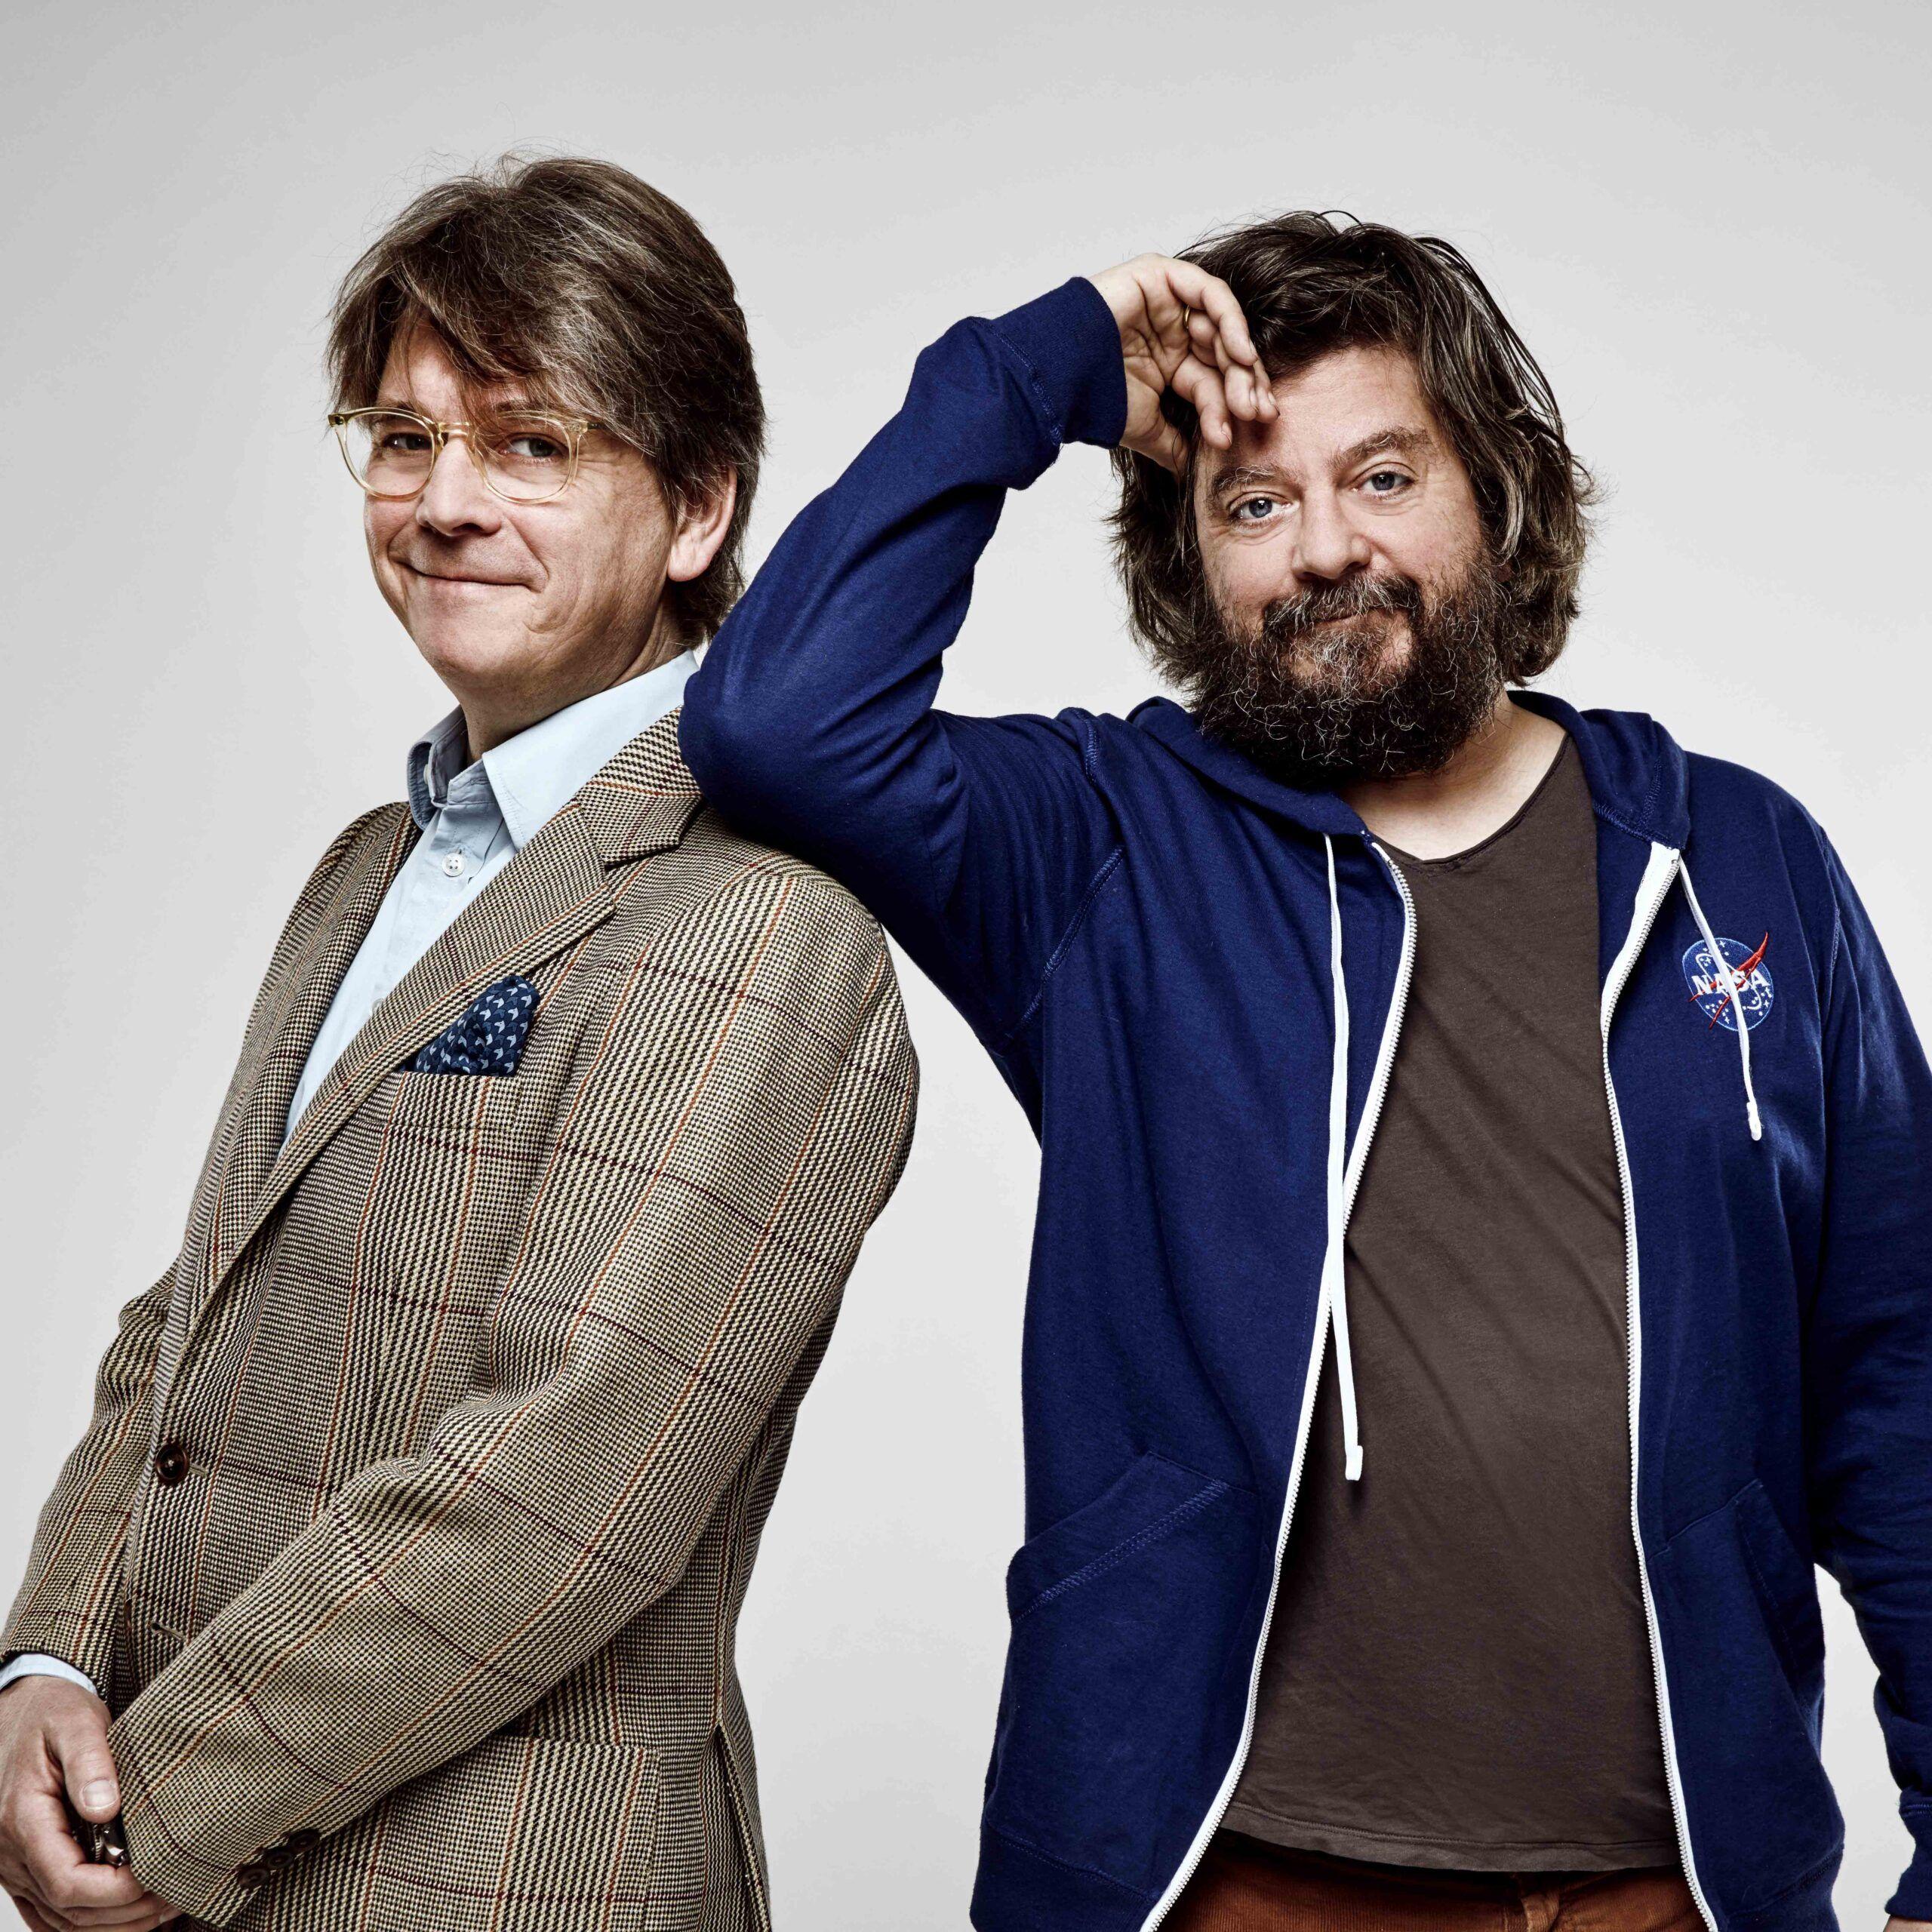 Anders & Peter Lund Madsen